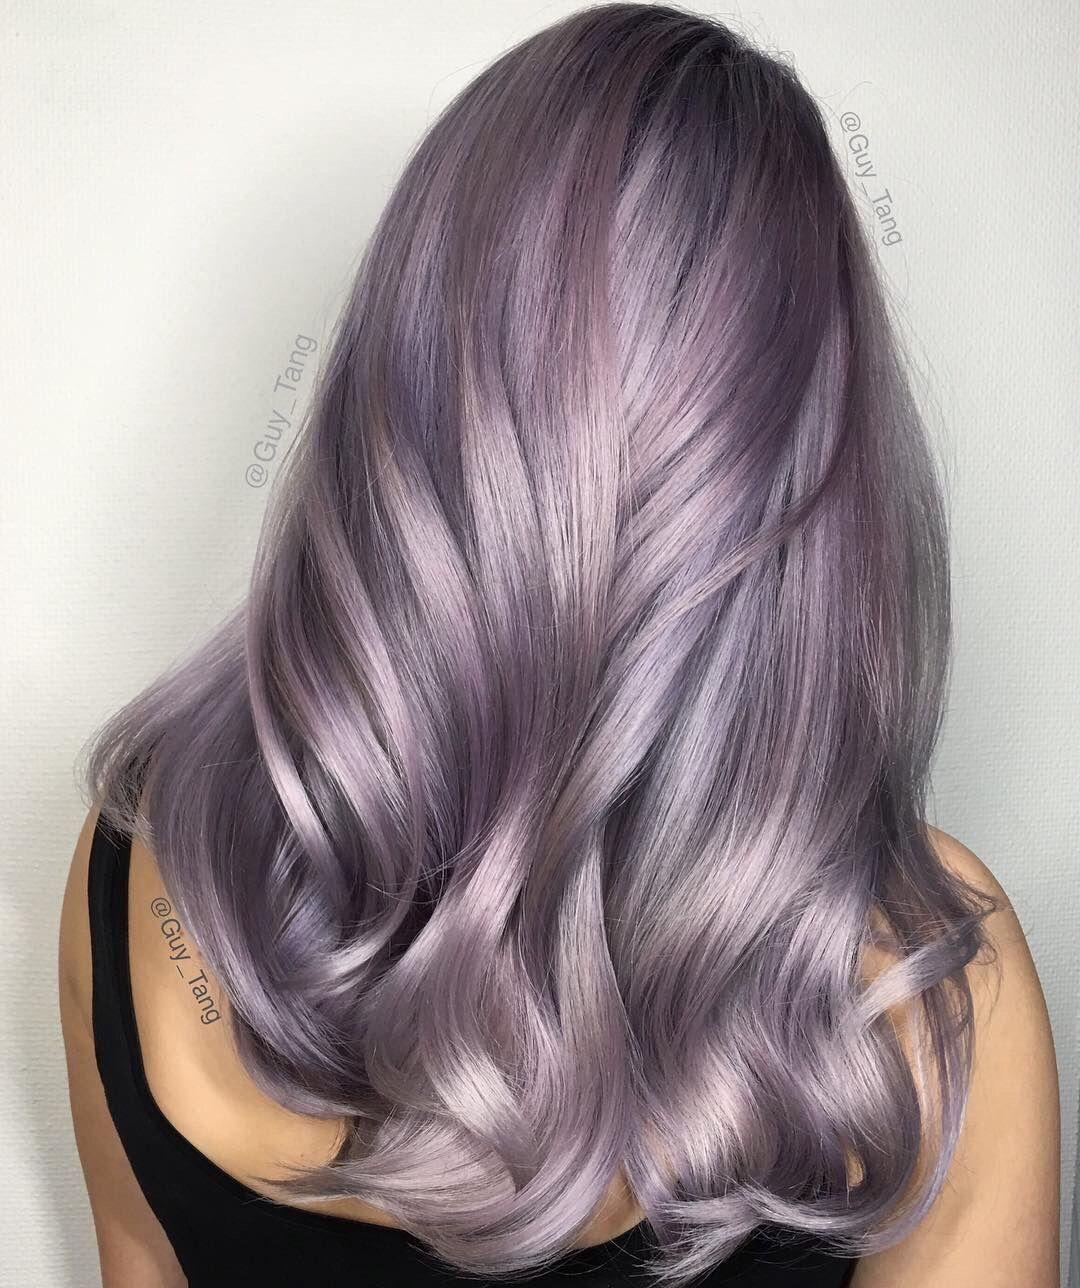 Pin by Elyssa Bradford on hair | Pinterest | Hair coloring, Hair ...